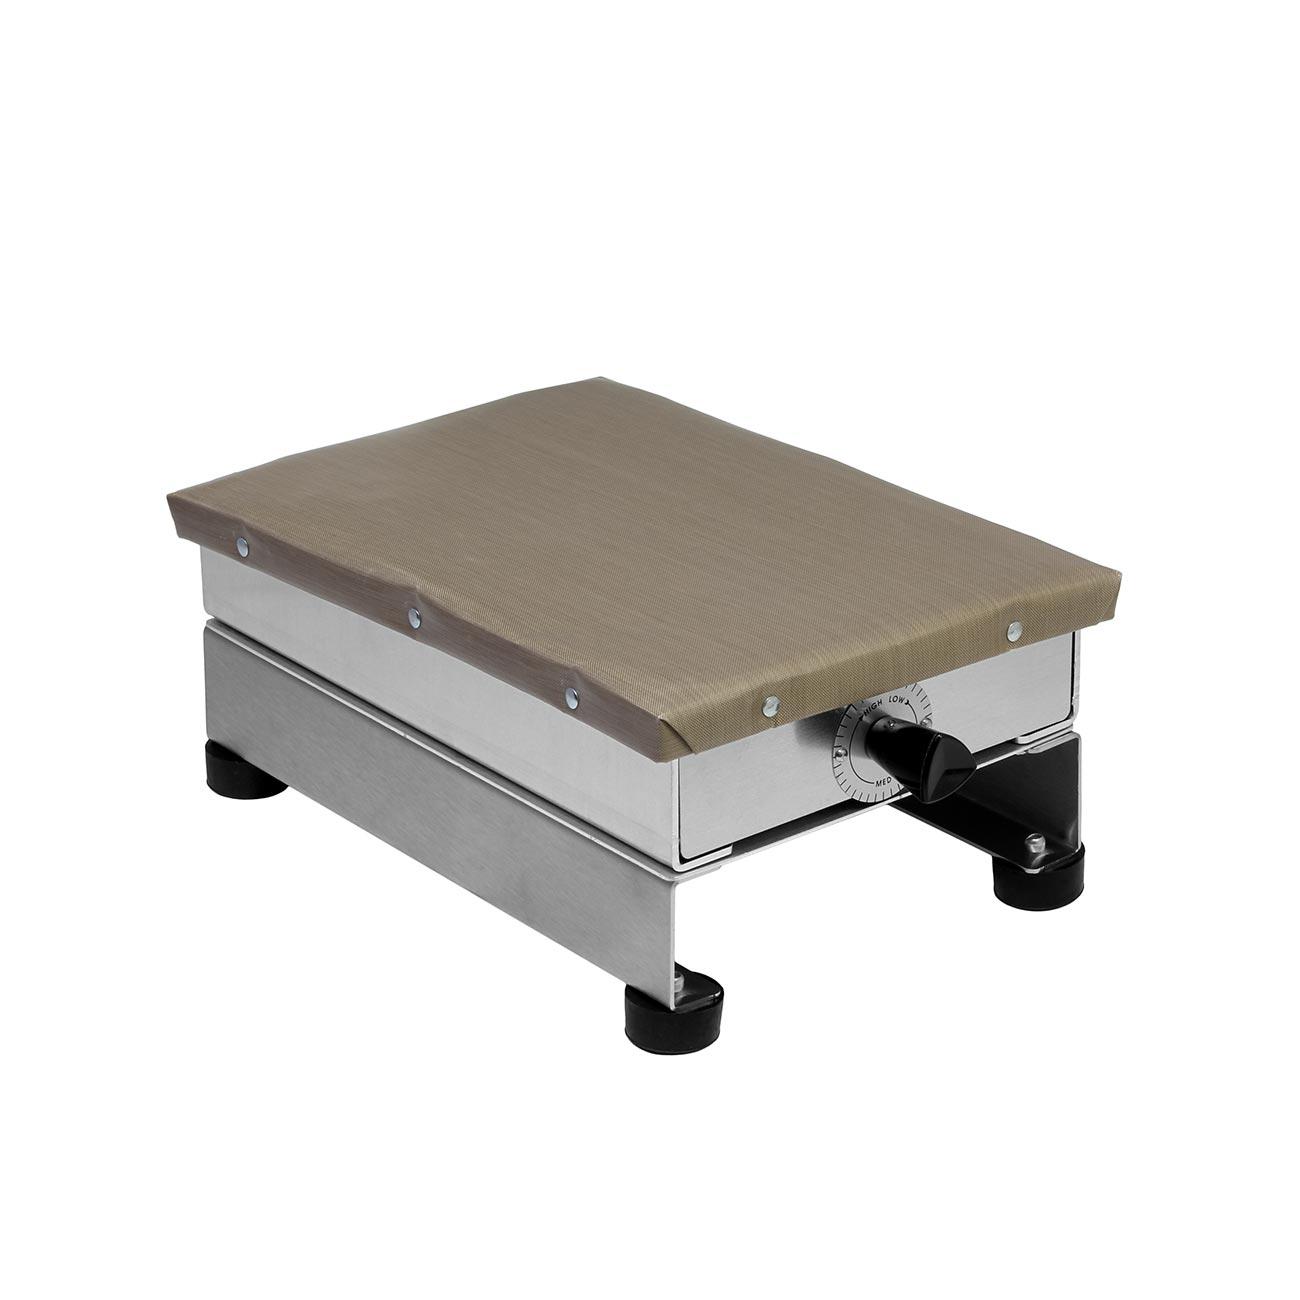 Alfa International TT-69 hotplate, countertop, electric